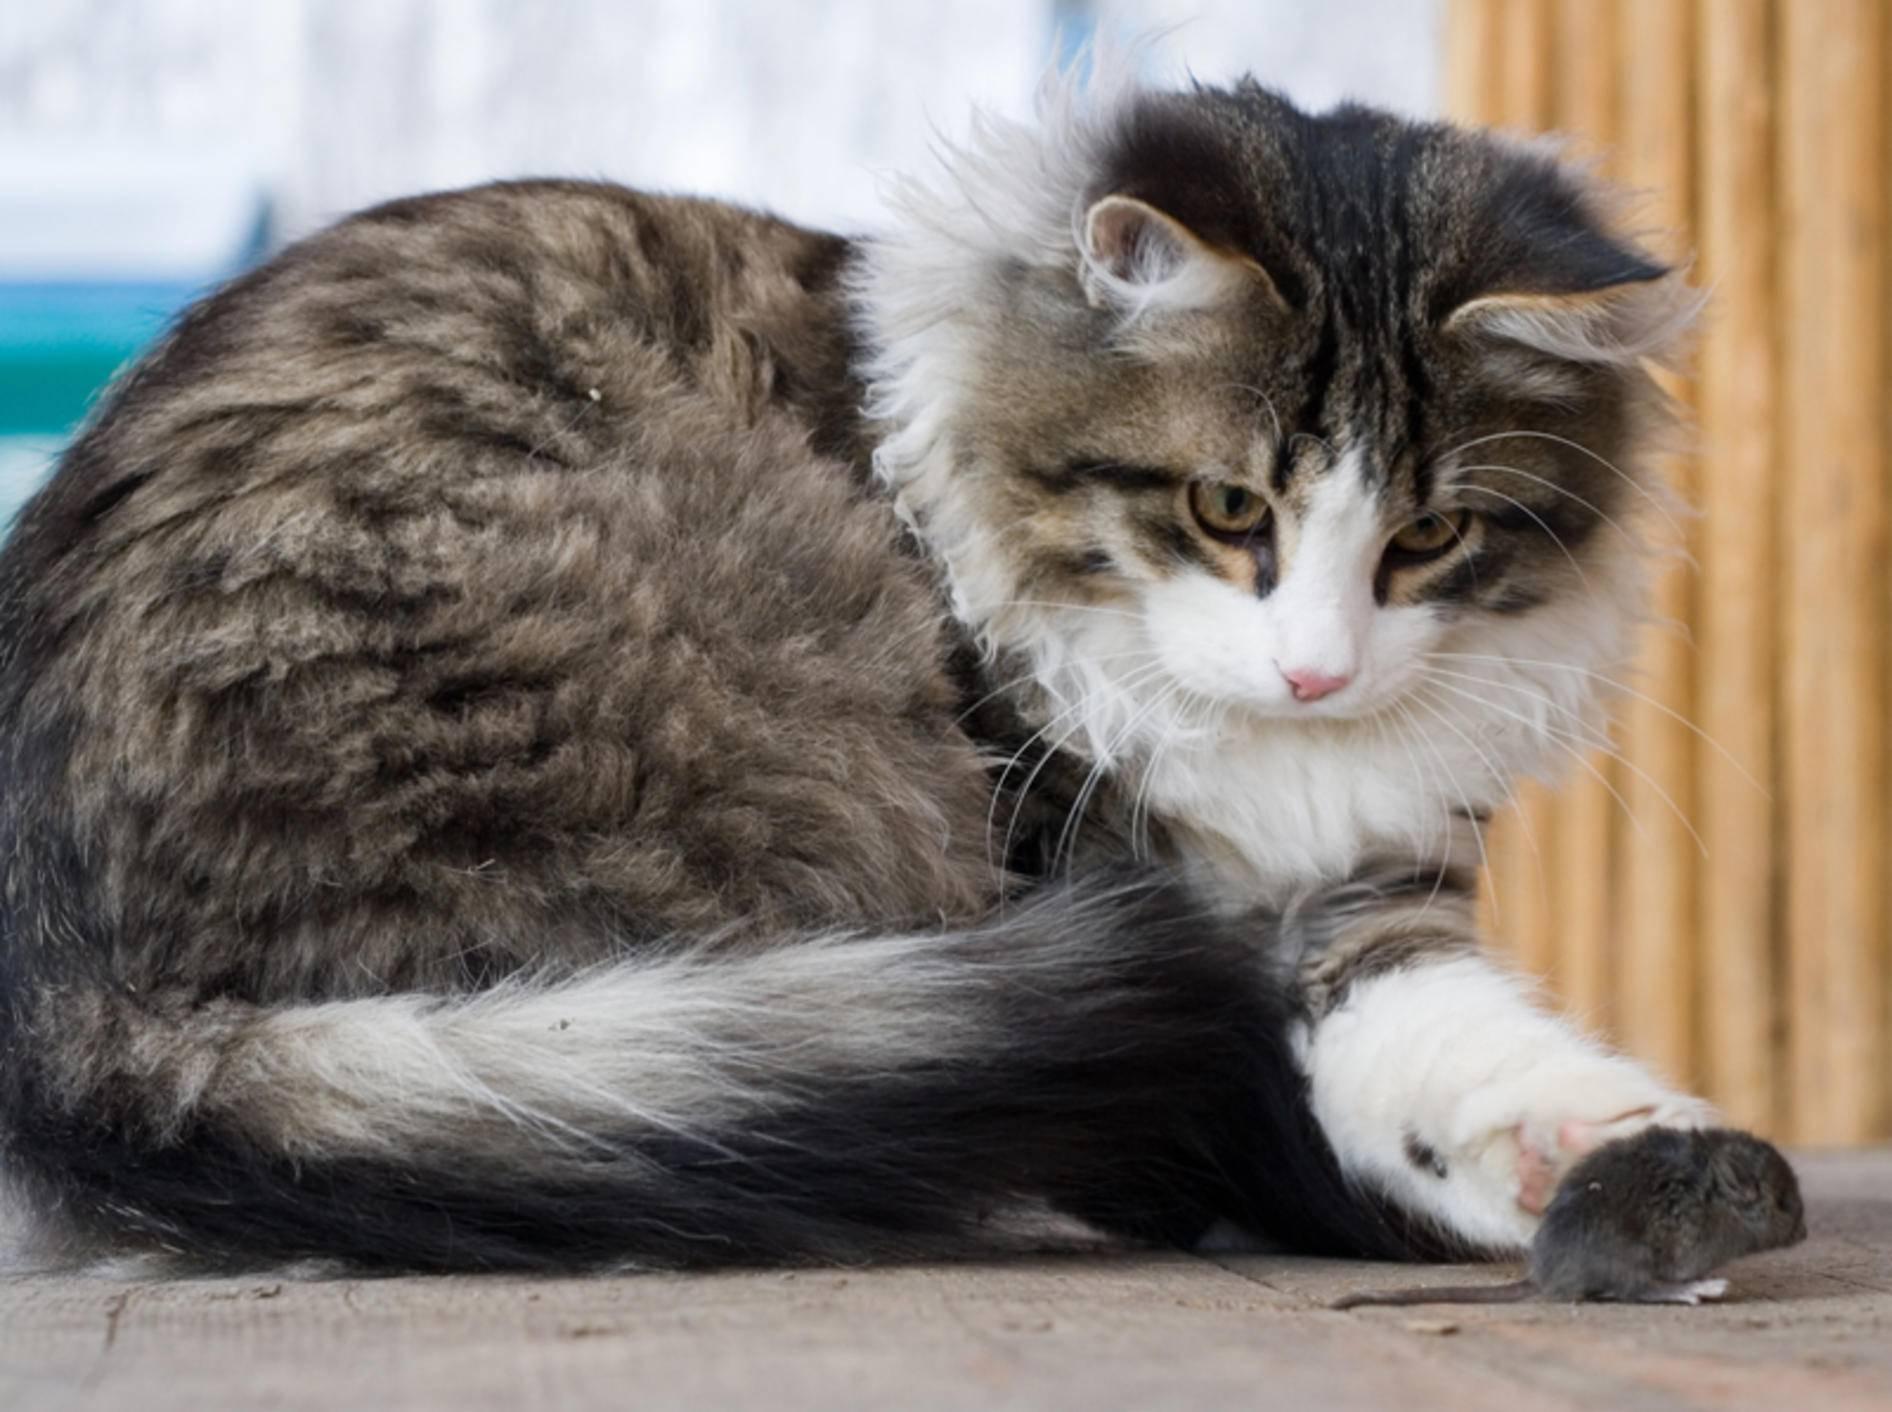 """Hab dich!"": Junge Katze bei der Mäusejagd – Shutterstock / Andrey Stratilatov"